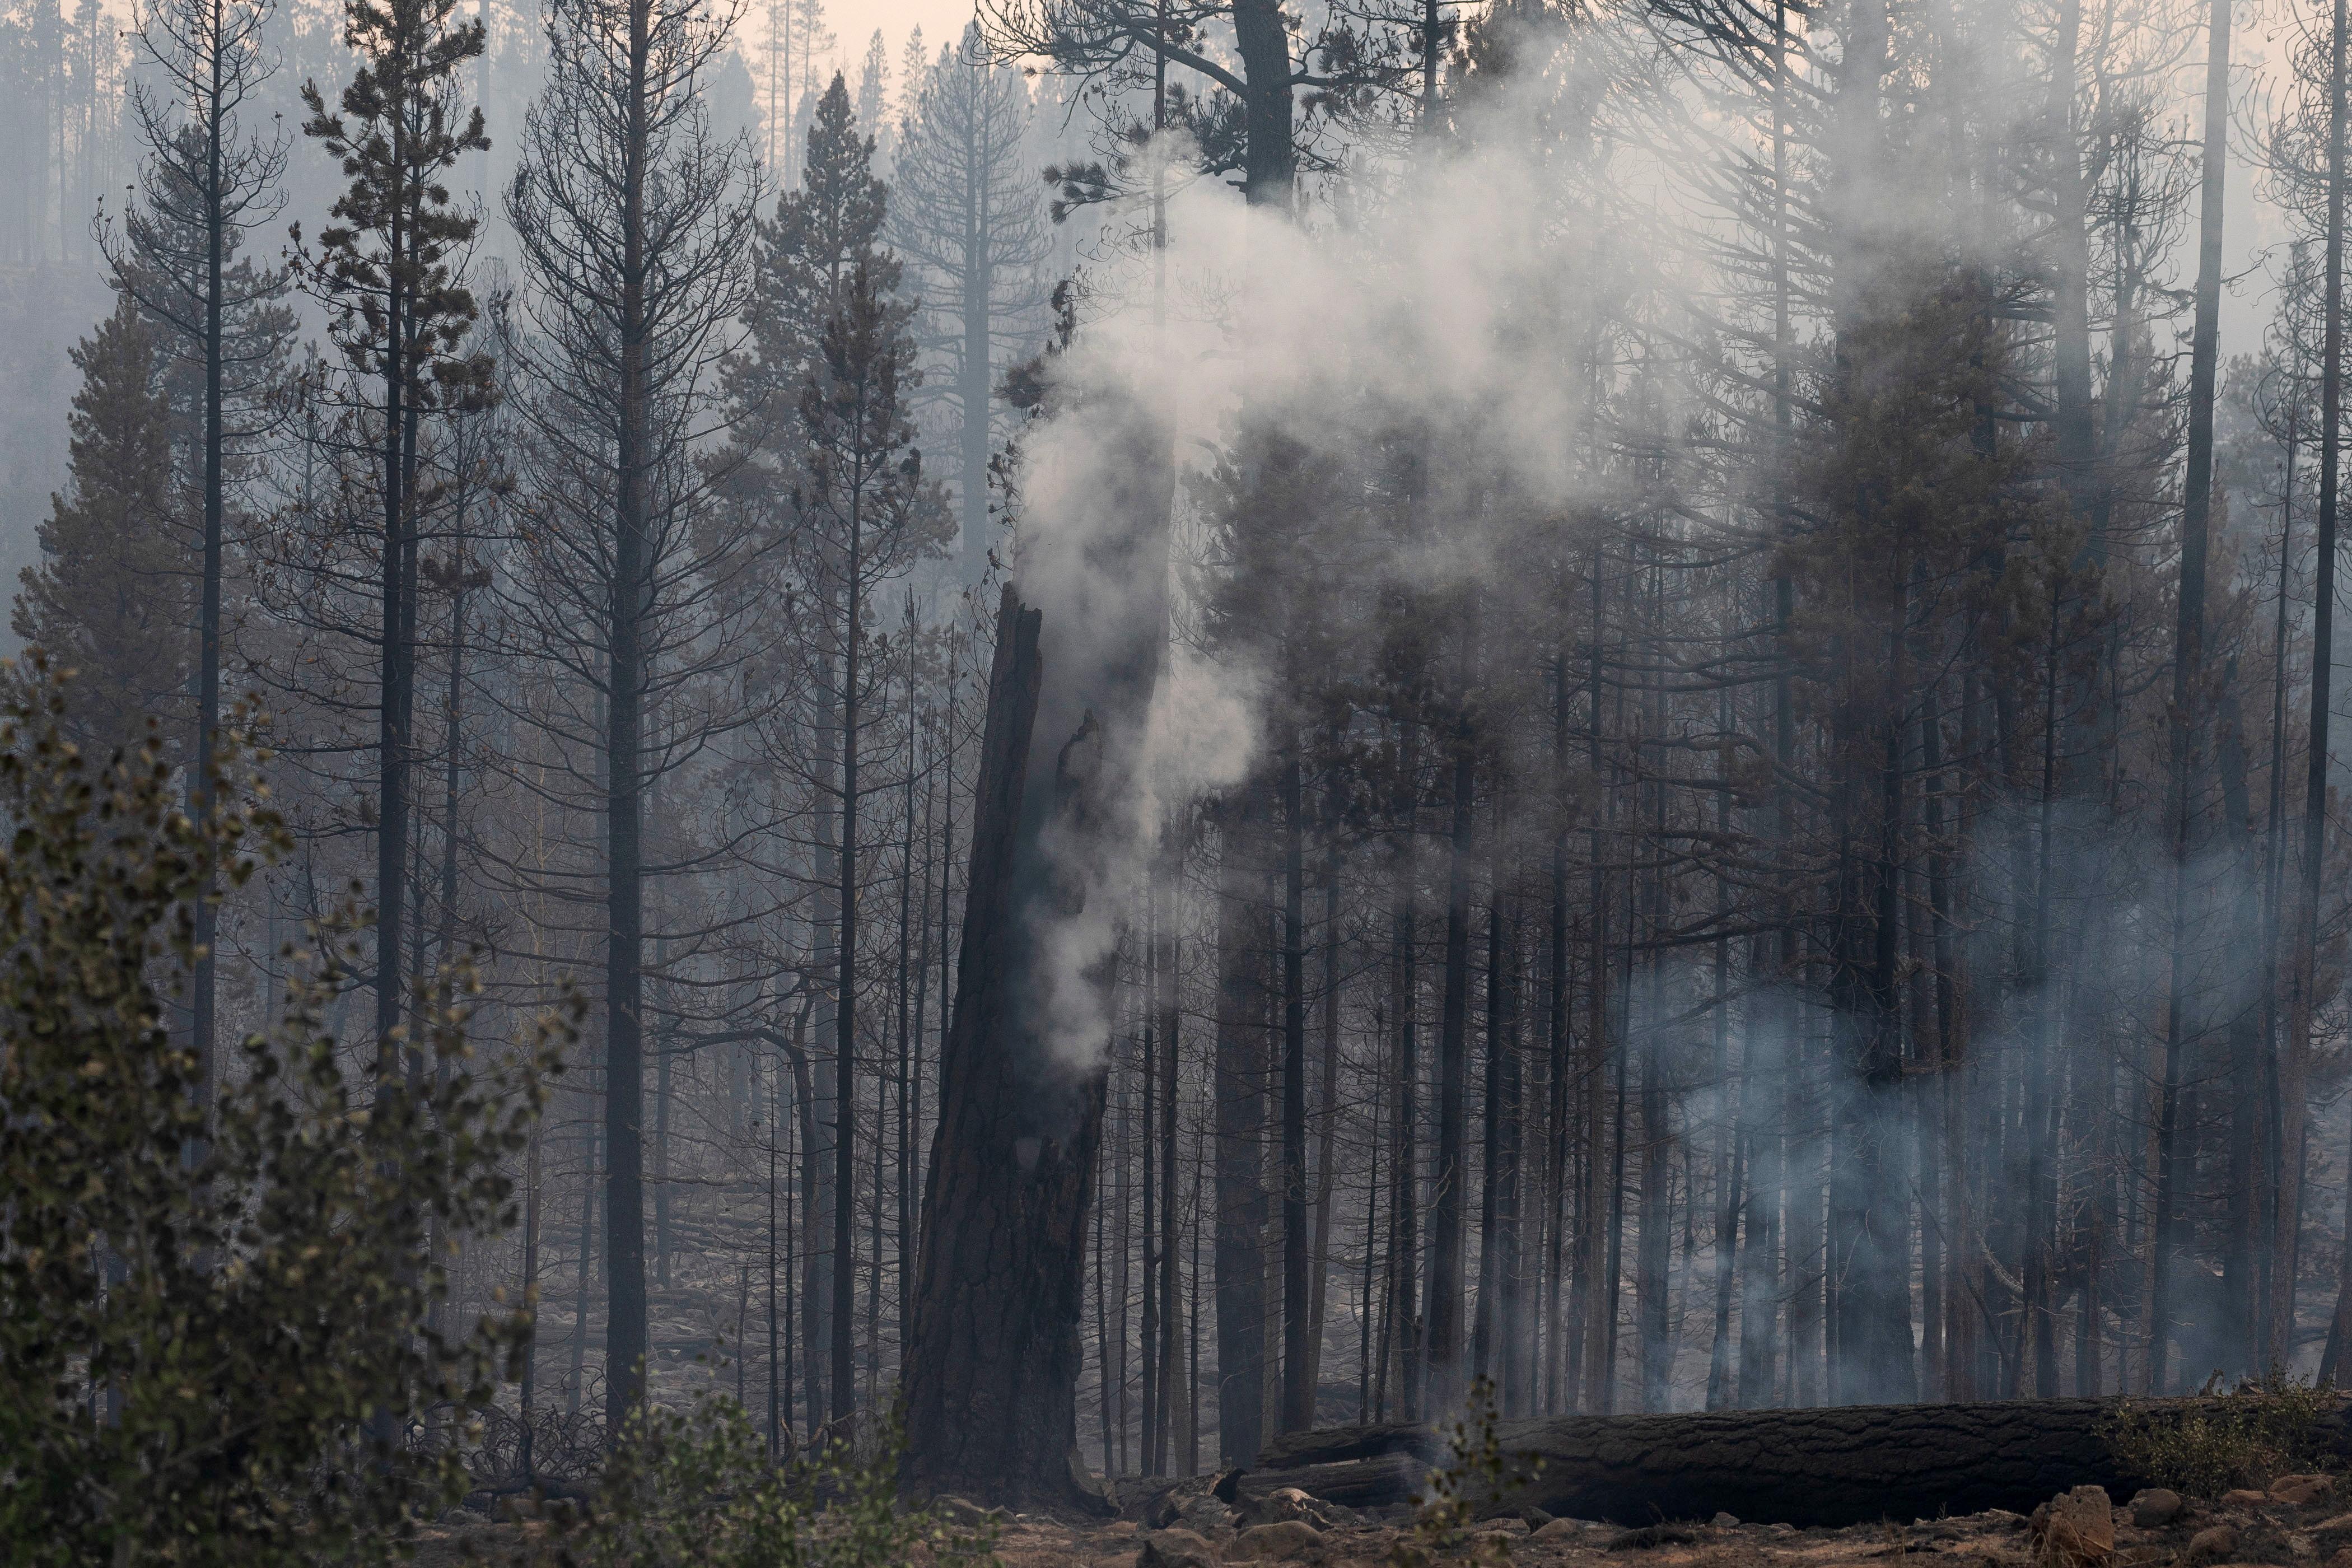 Smoke billows from a tree trunk as the Bootleg Fire burns through vegetation near Paisley, Oregon, U.S., July 20, 2021.  REUTERS/David Ryder